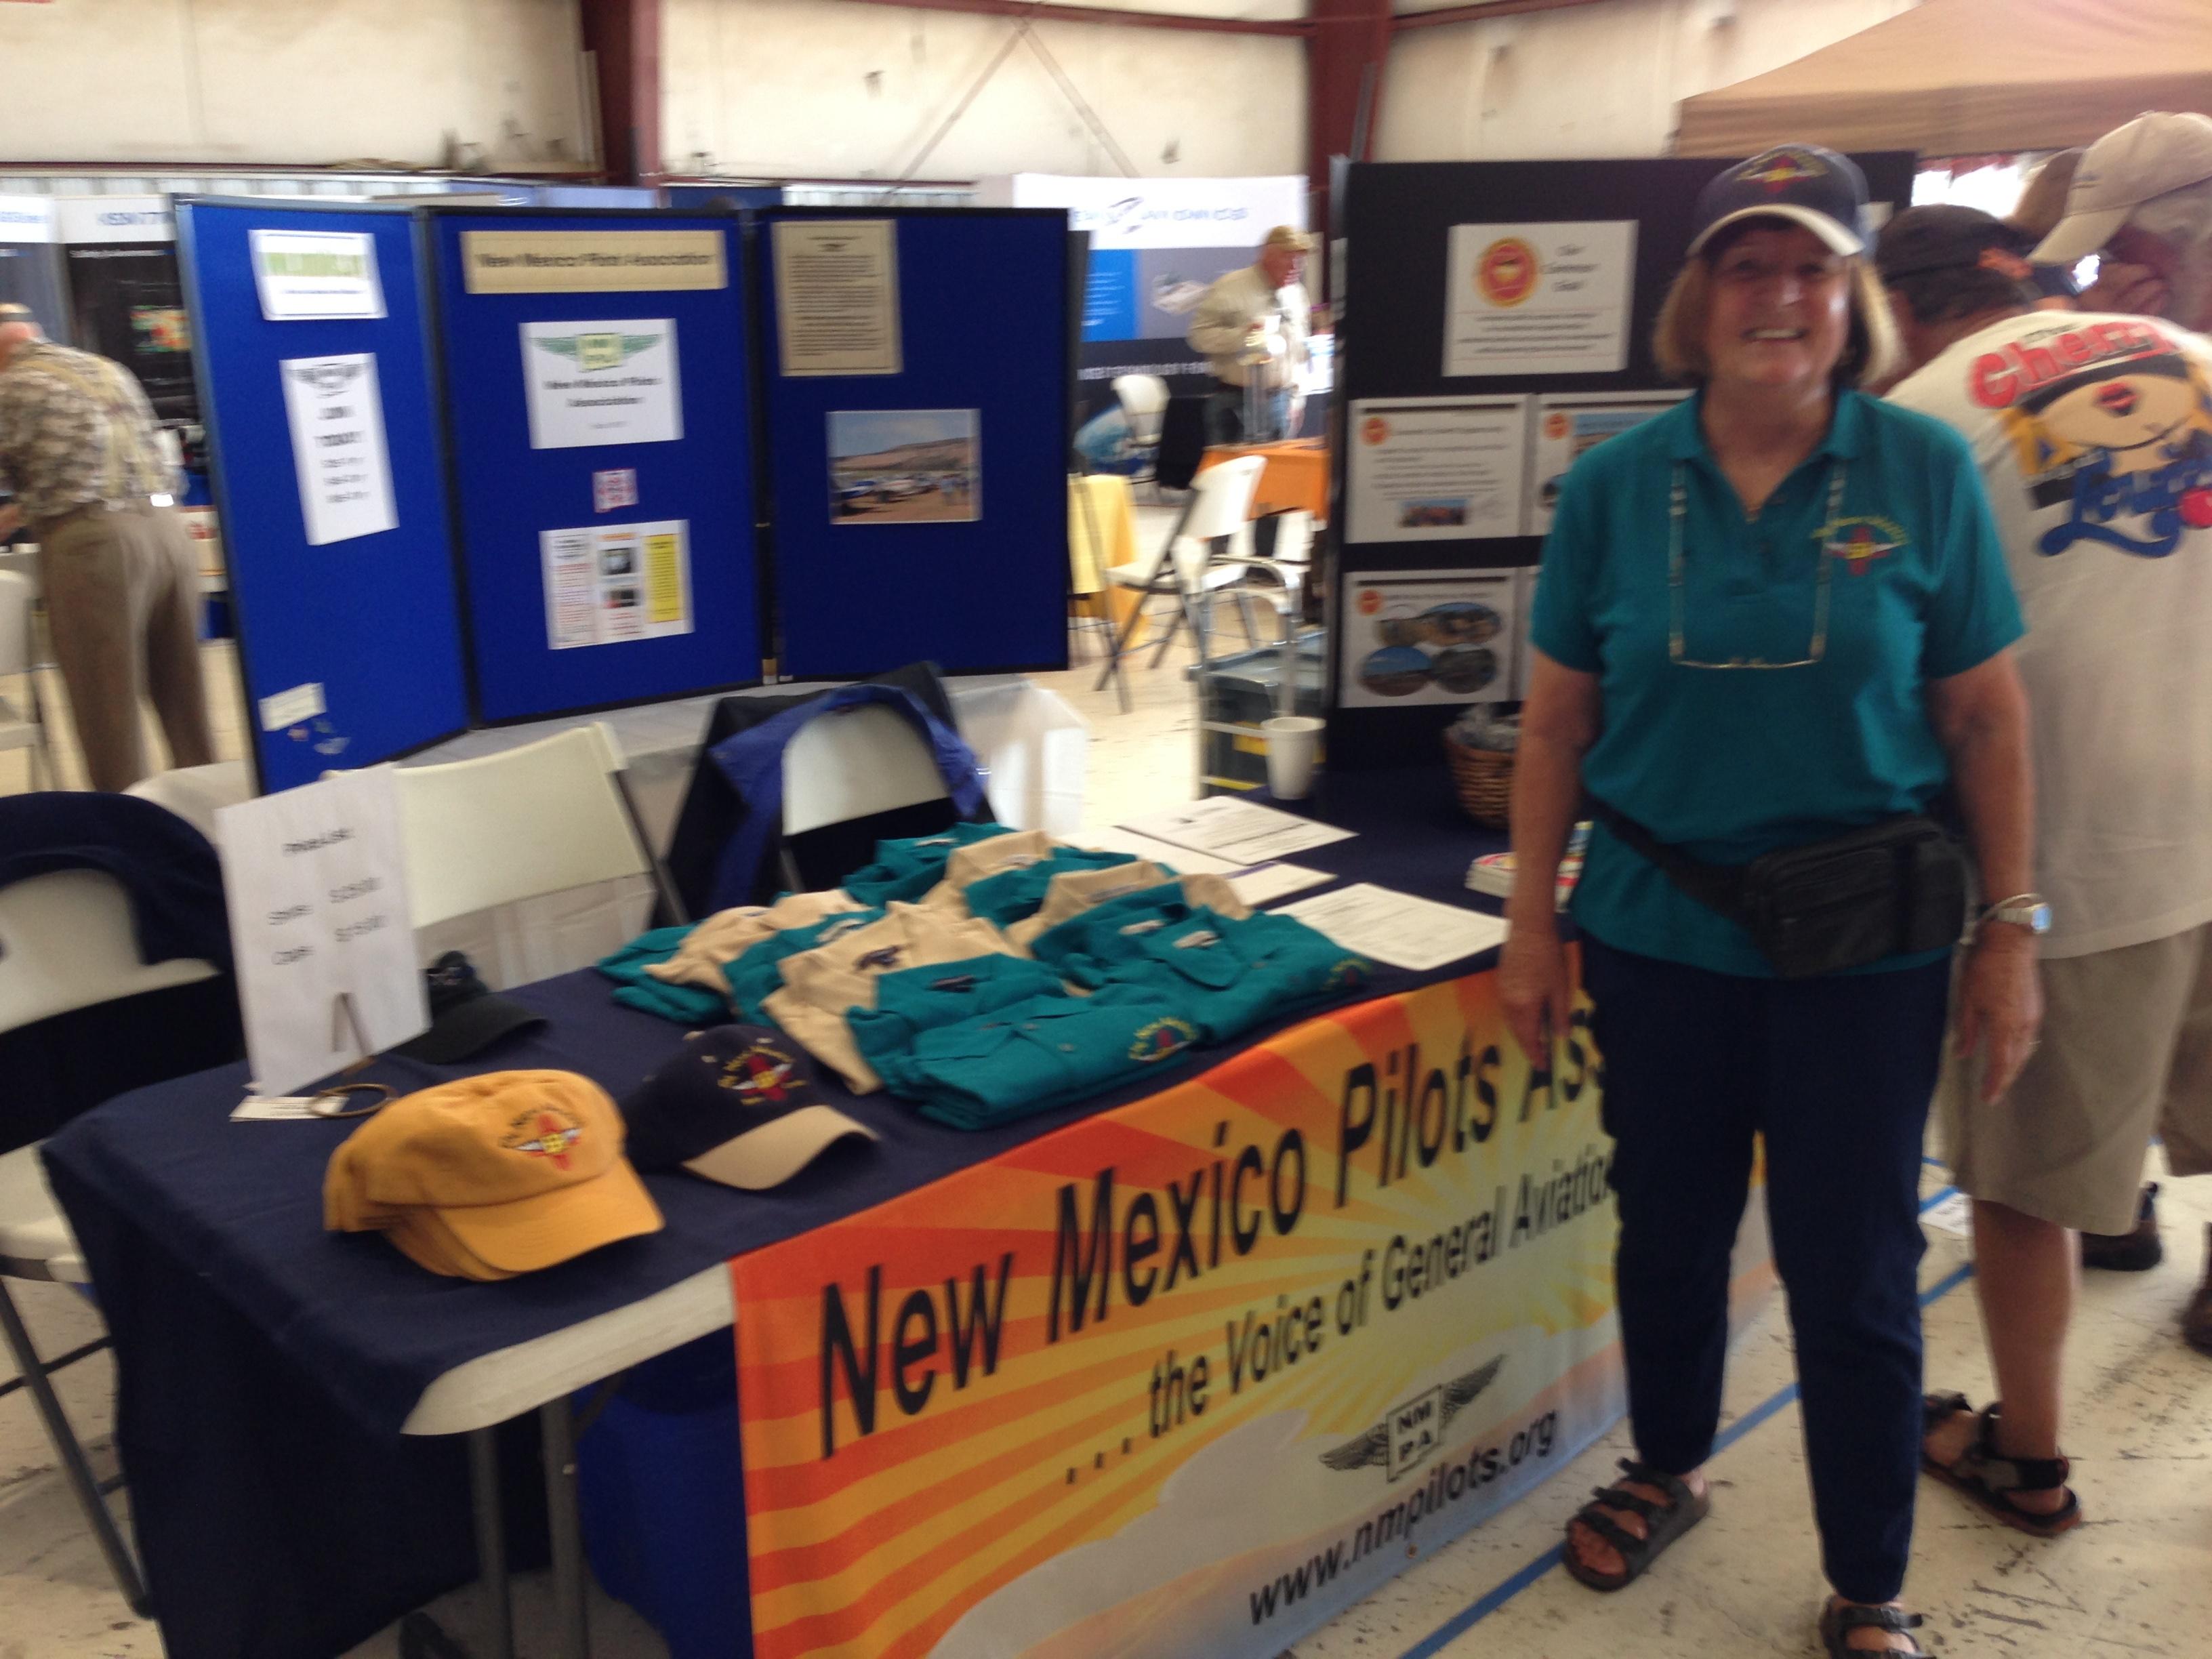 New Mexico Pilots Association